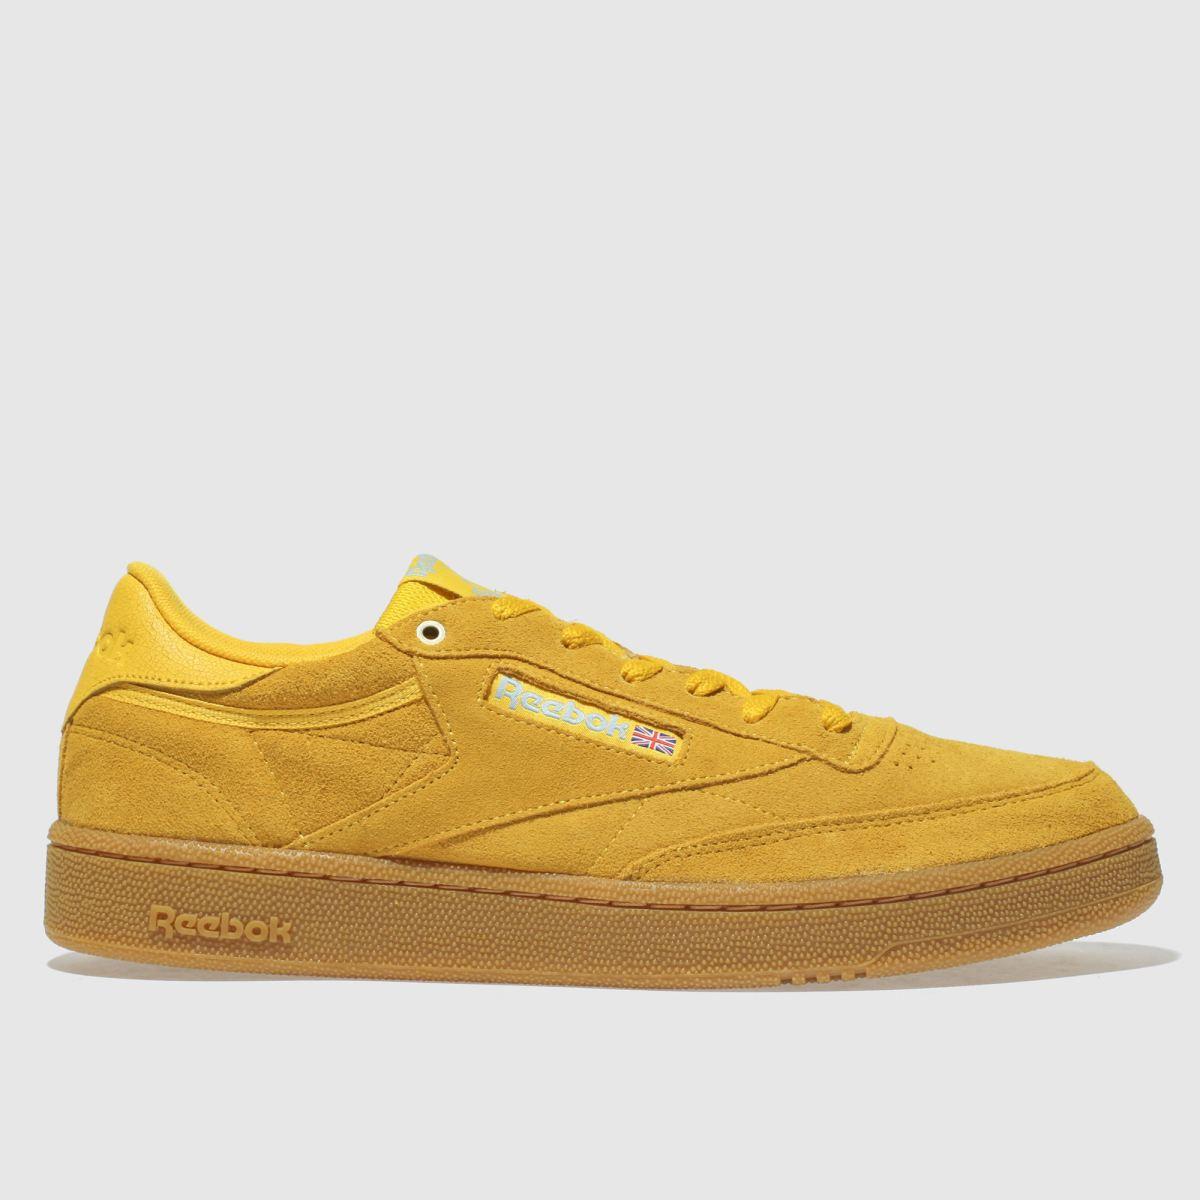 4dd84fc4409 Reebok Yellow Club C 85 Trainers - Schuh at Westquay - Shop Online